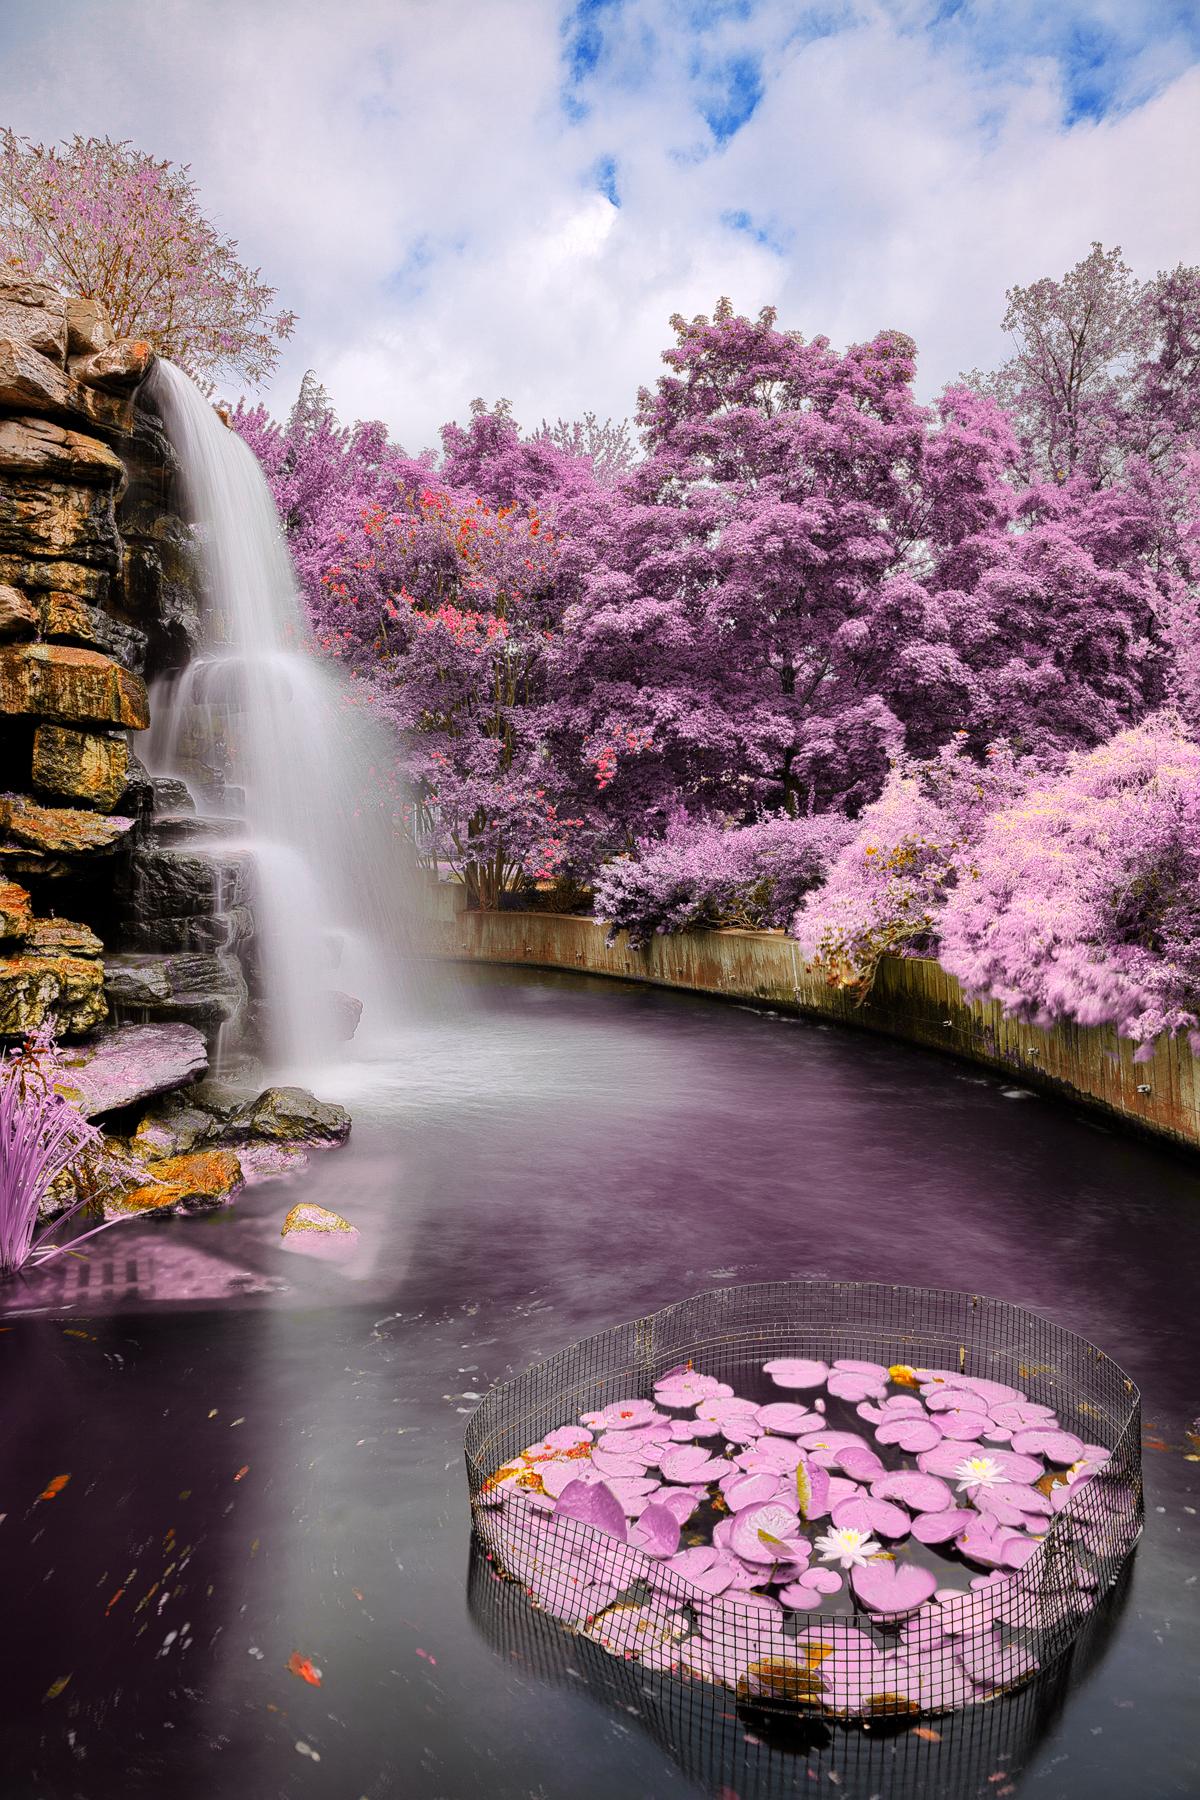 Zoo Waterfall - Ultra Violet HDR, America, Pretty, Scenery, Scene, HQ Photo